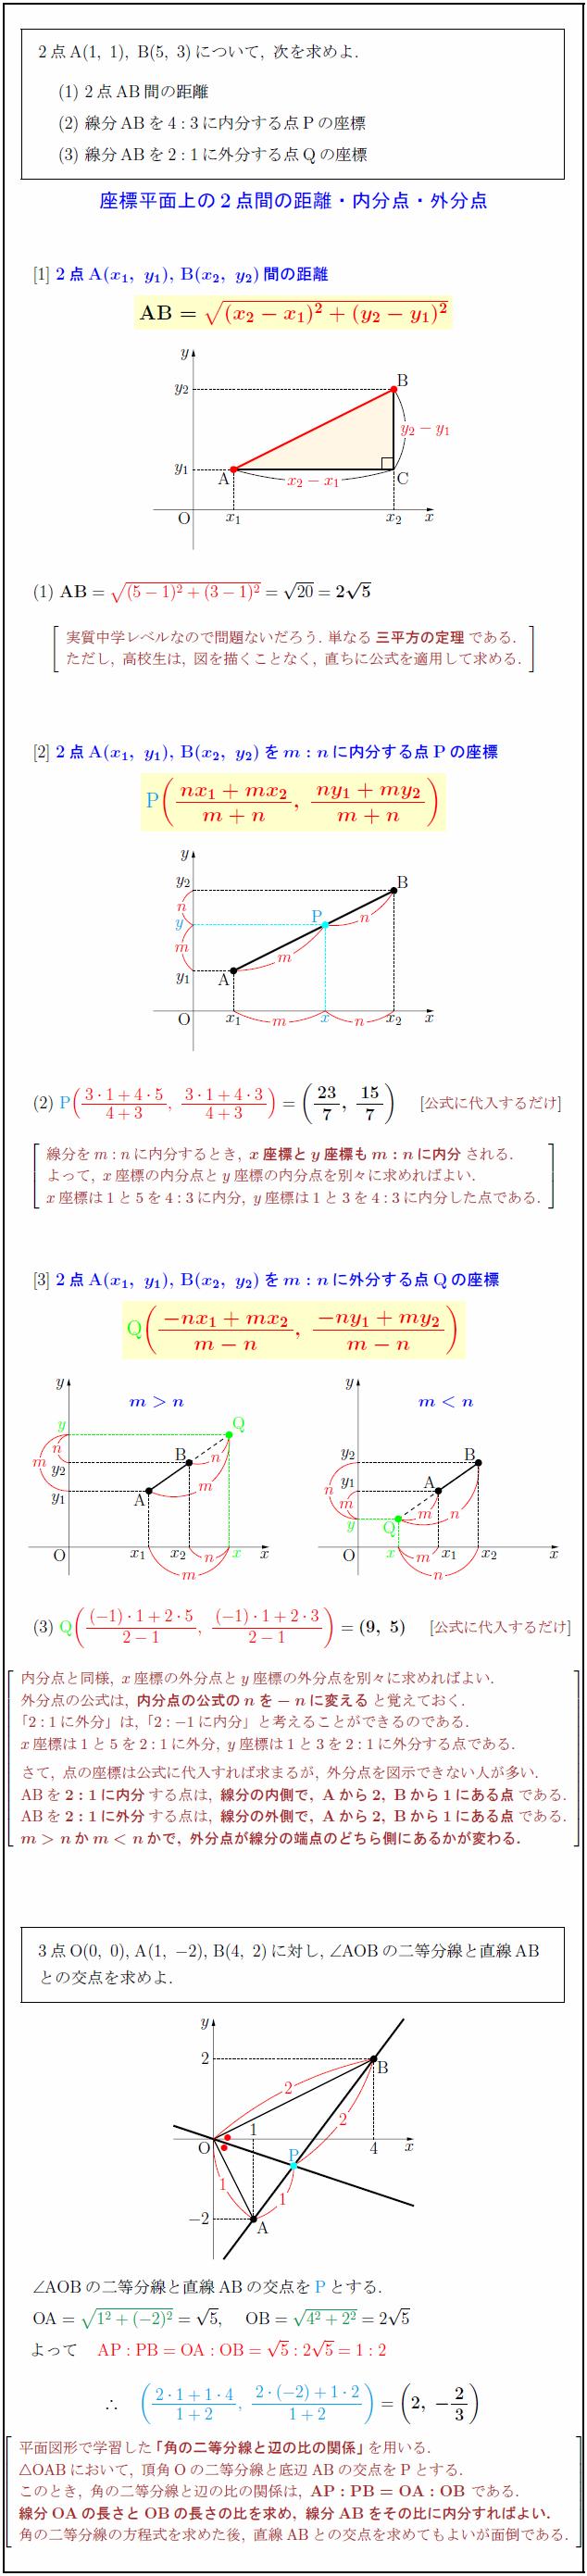 equinoctial-point